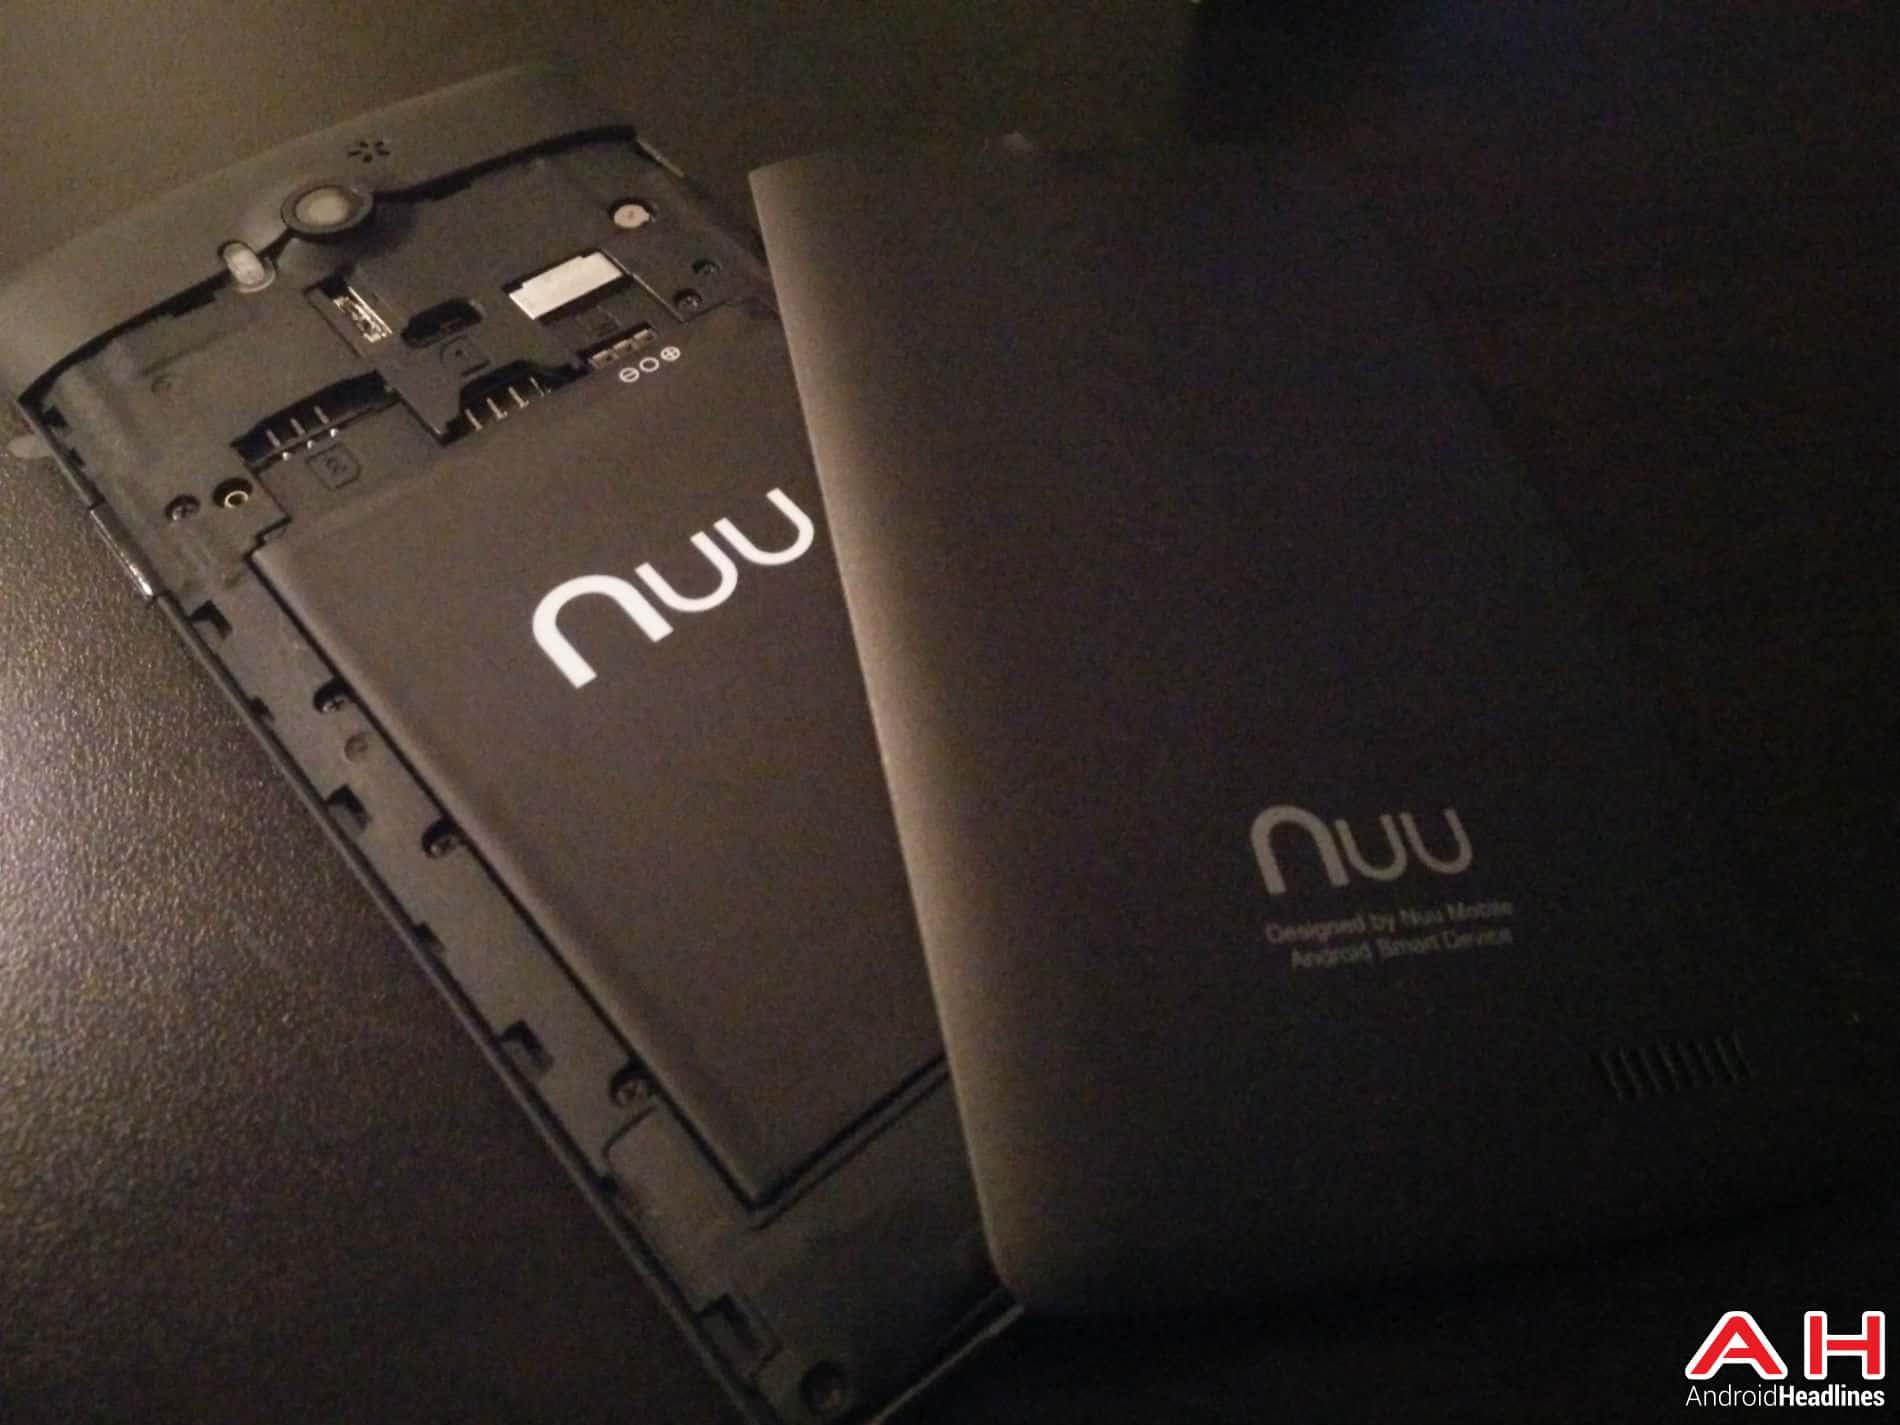 Nuu Mobile X1 AH - 9